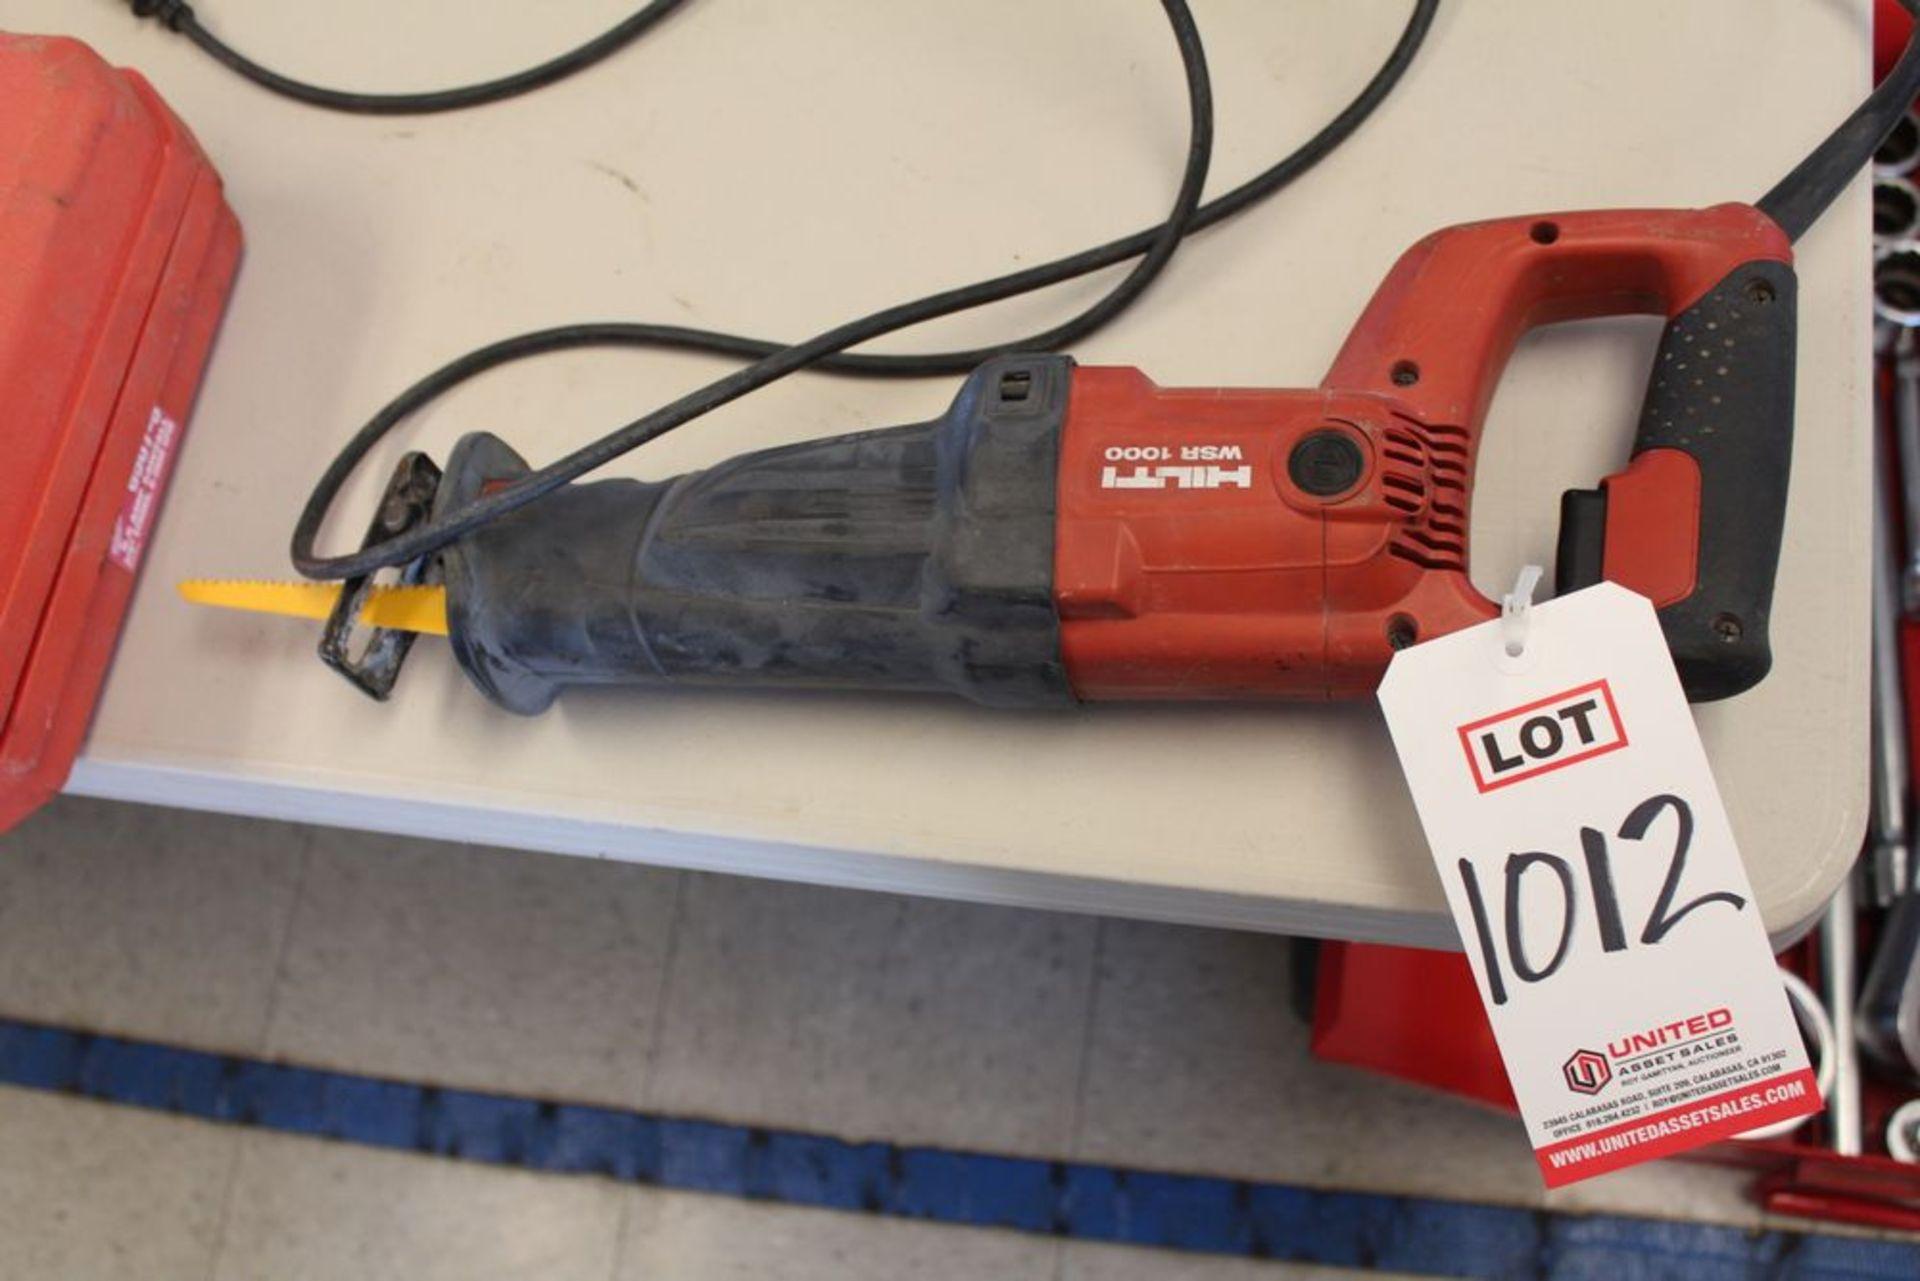 Lot 1012 - HILTI MODEL WSR-1000 RECIPROCATING SAW, (LUNCHROOM)